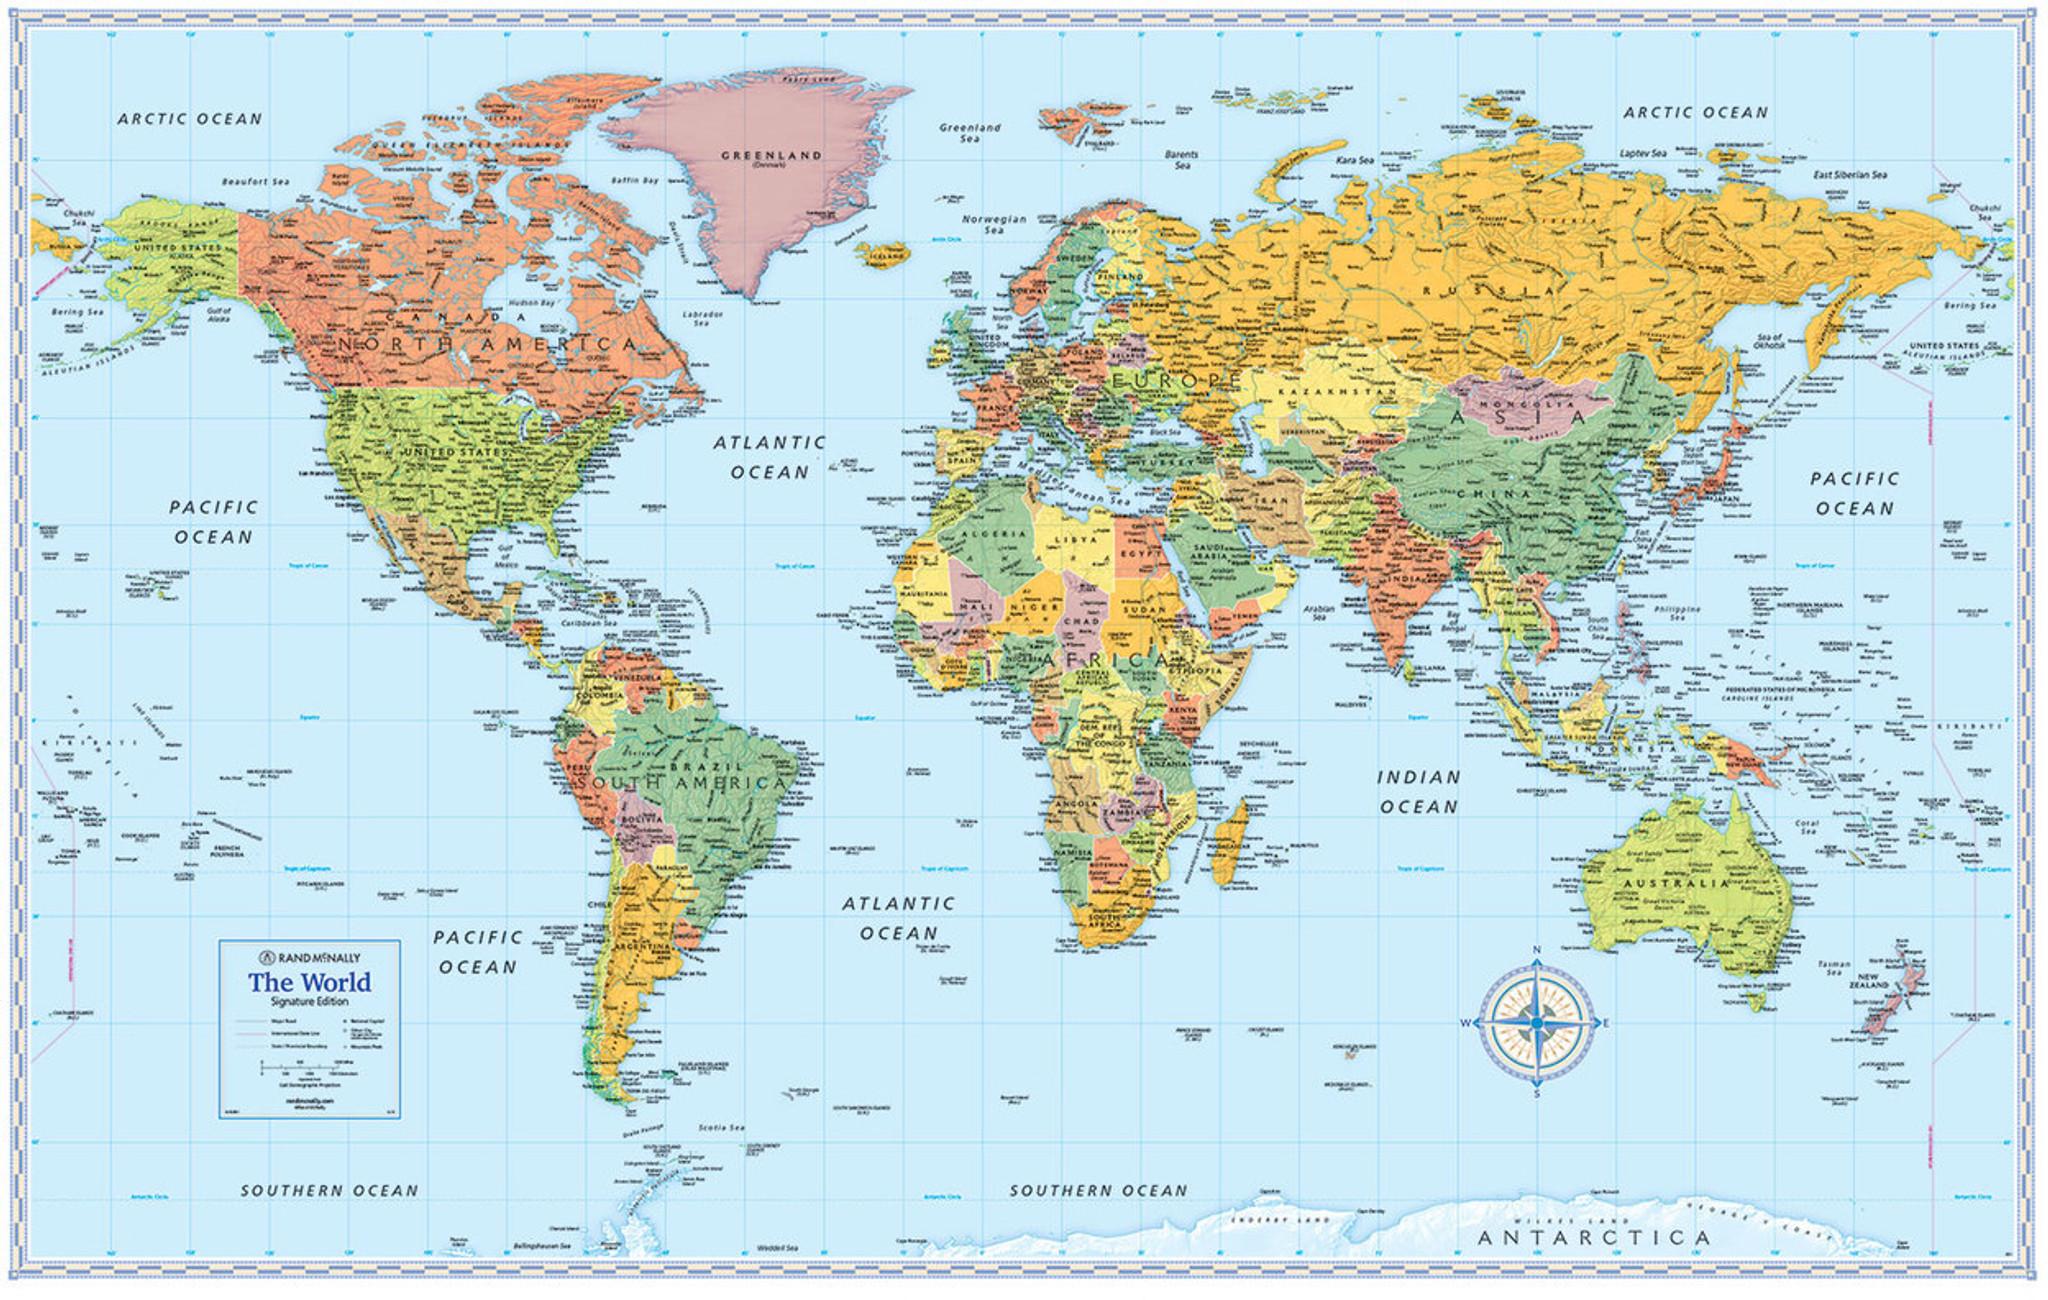 Signature edition world wall maps rand mcnally store signature edition world wall maps gumiabroncs Image collections